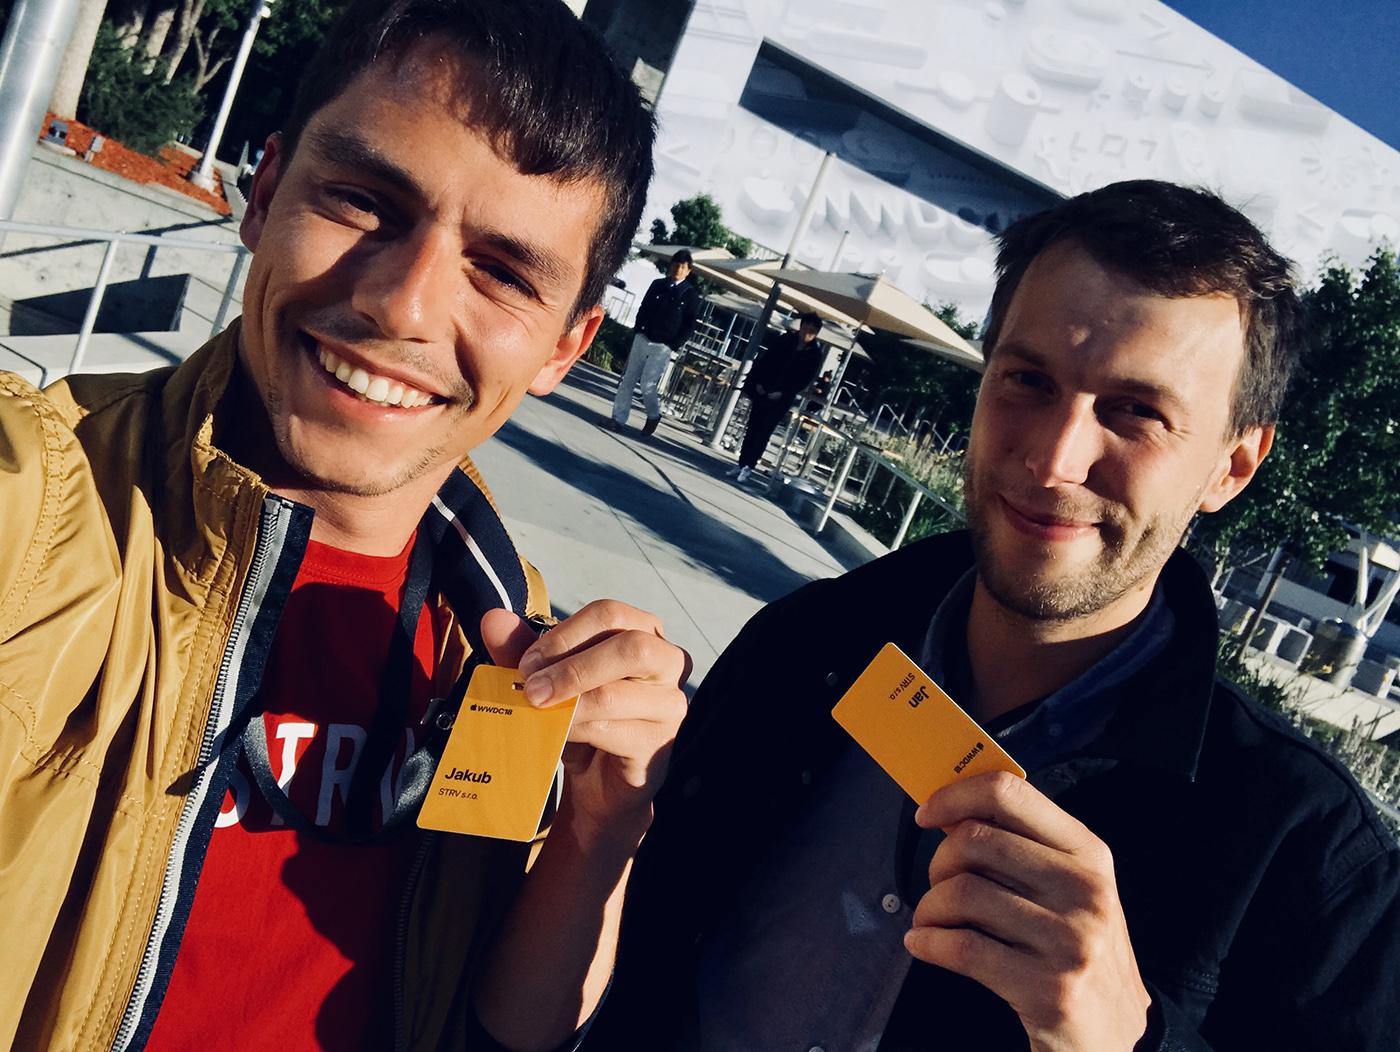 Jakub Kašpar a Honza Remeš z STRV na konferenci WWDC 2018